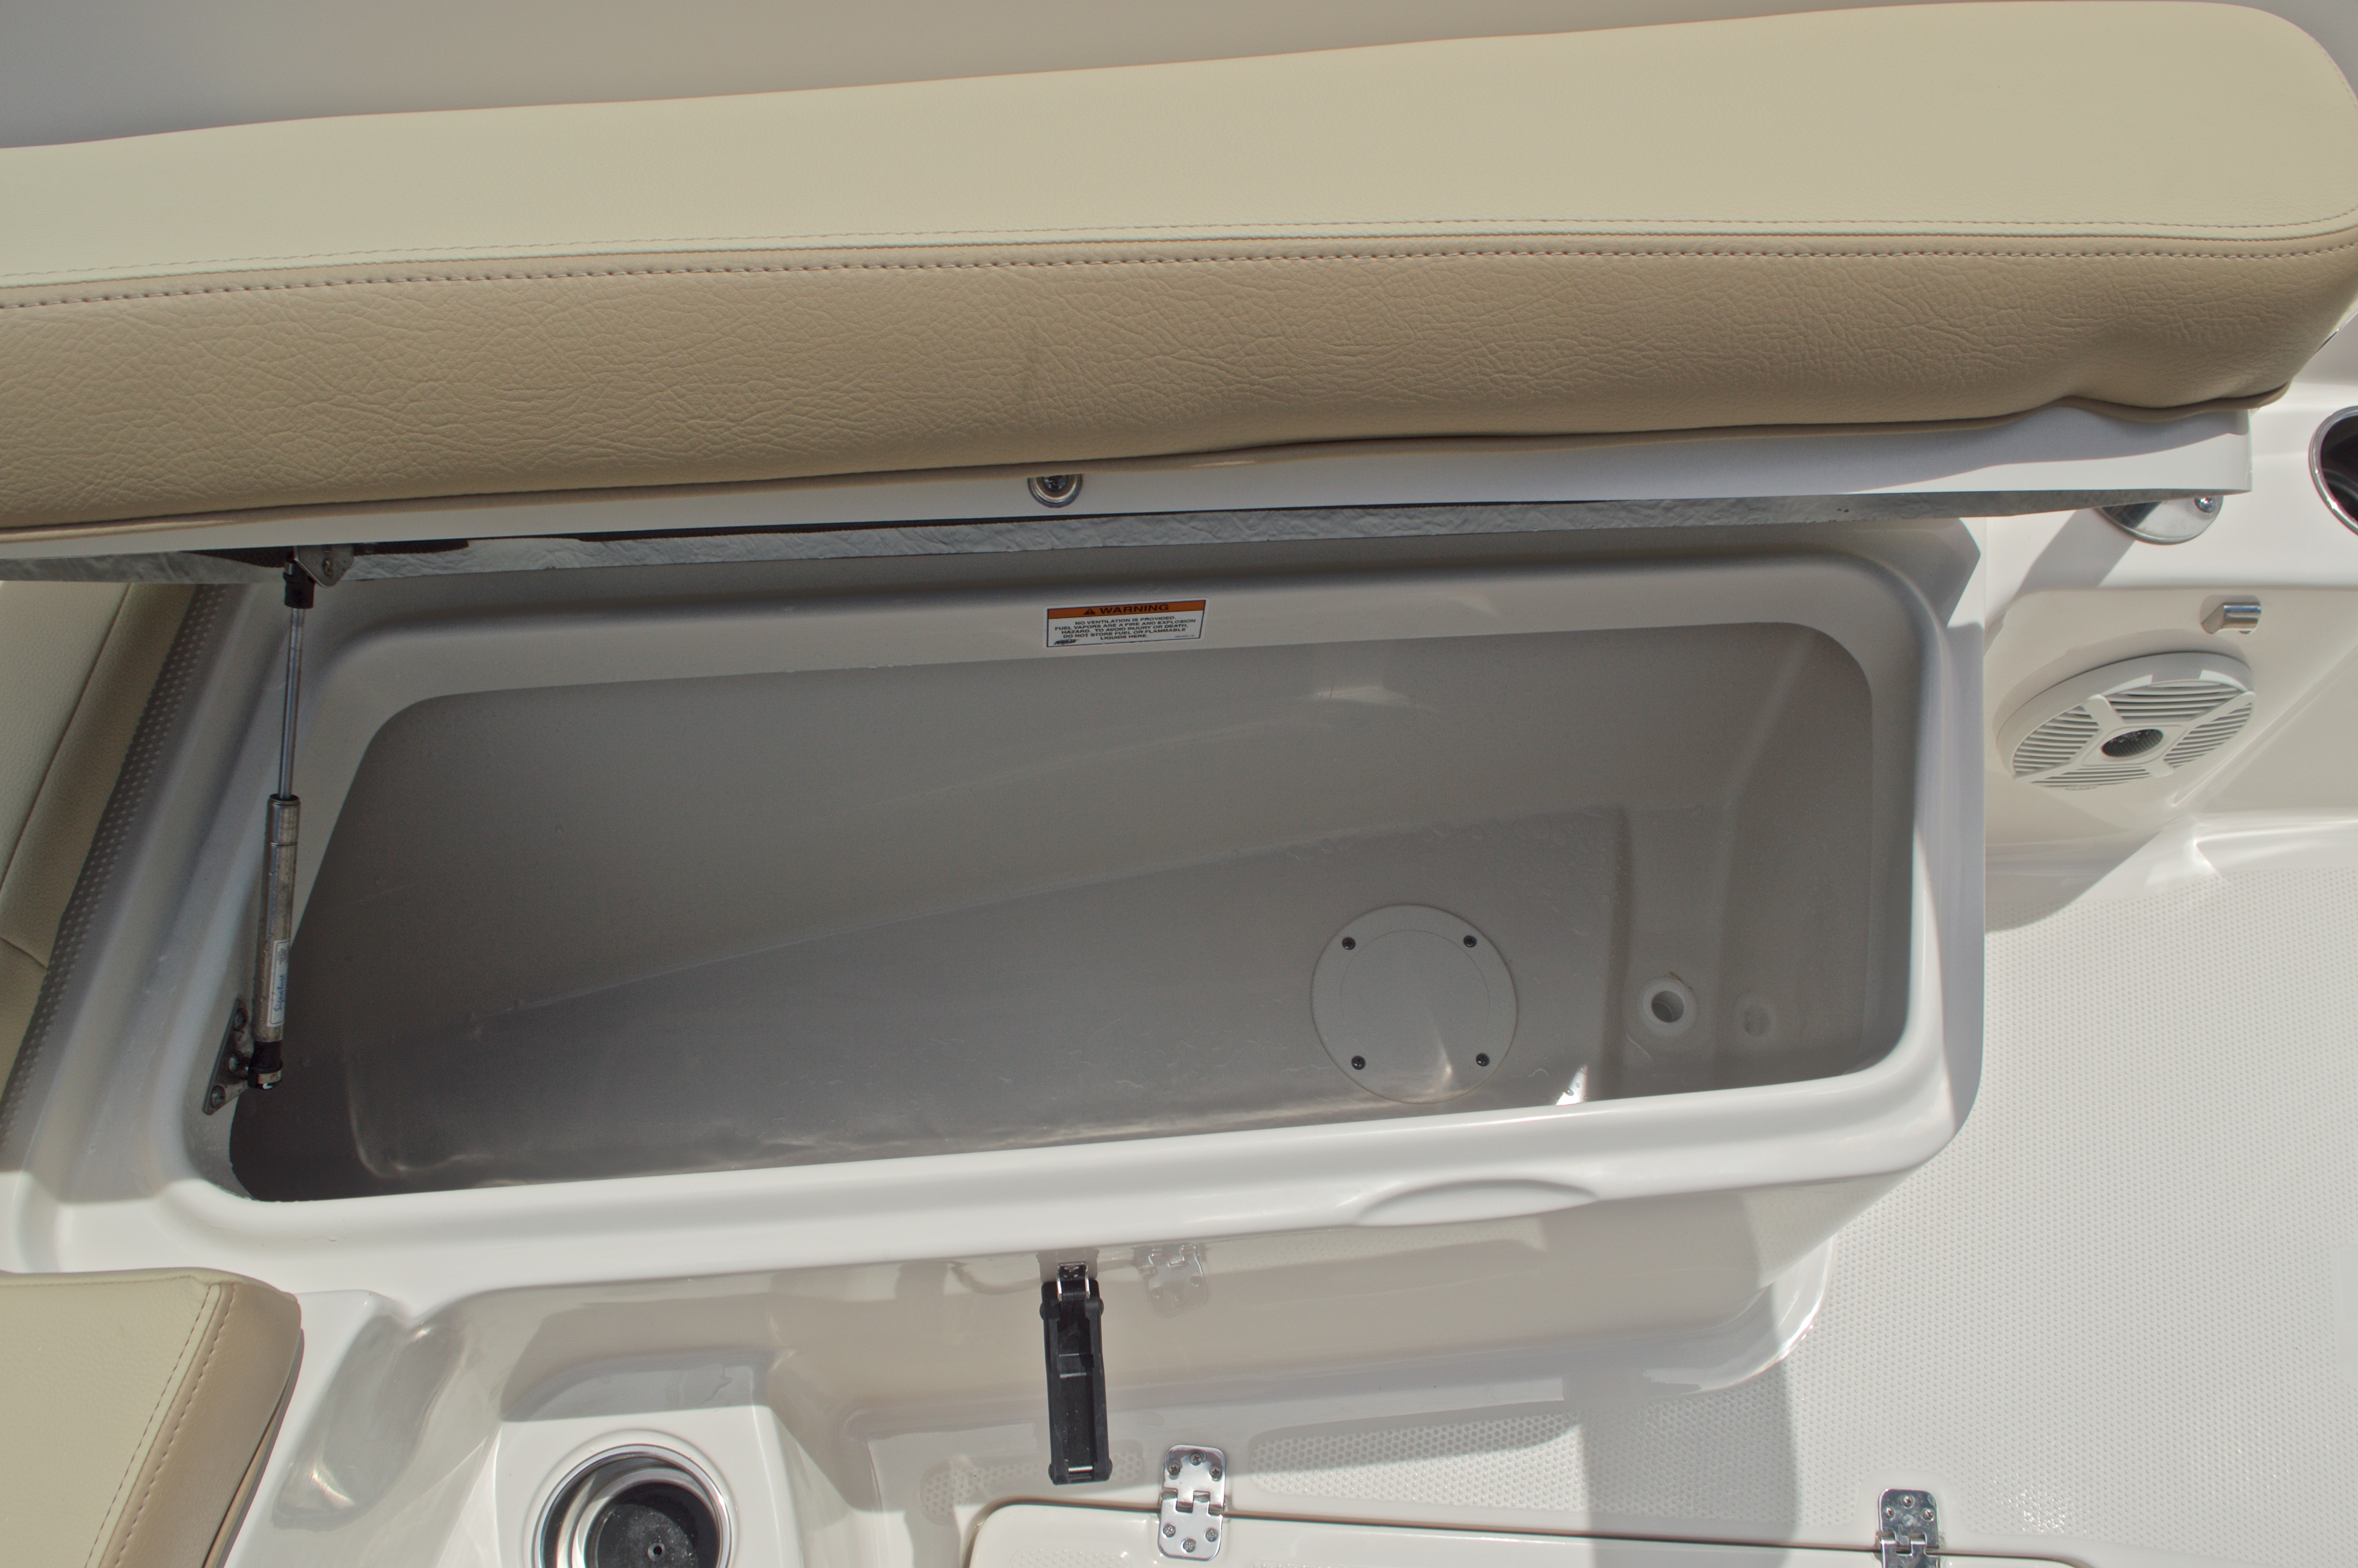 Thumbnail 51 for New 2017 Sailfish 240 CC Center Console boat for sale in Miami, FL